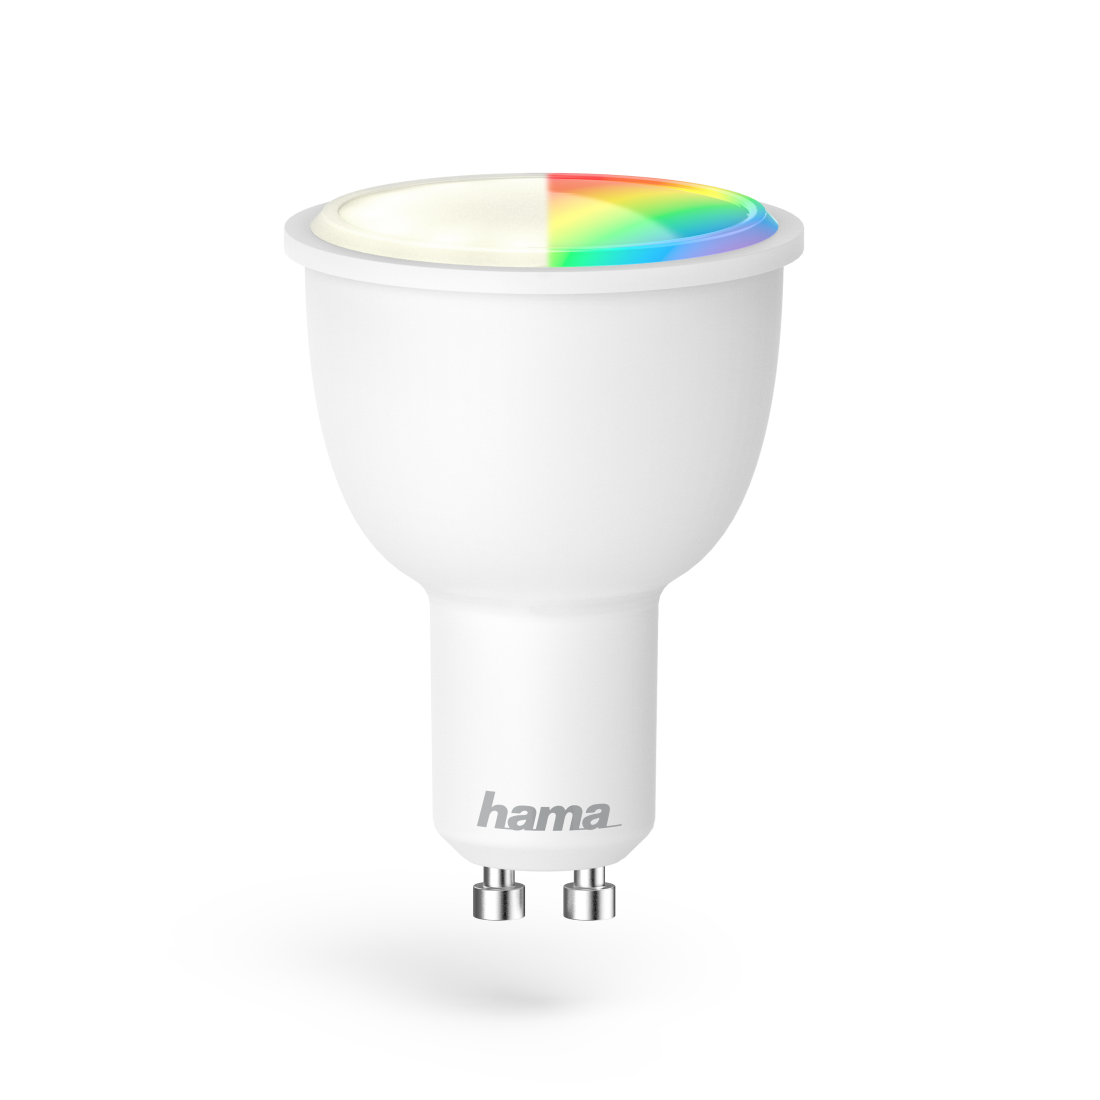 00176532 Hama WiFi-LED-Lampe, GU10, 4,5W, RGB, dimmbar   hama.at